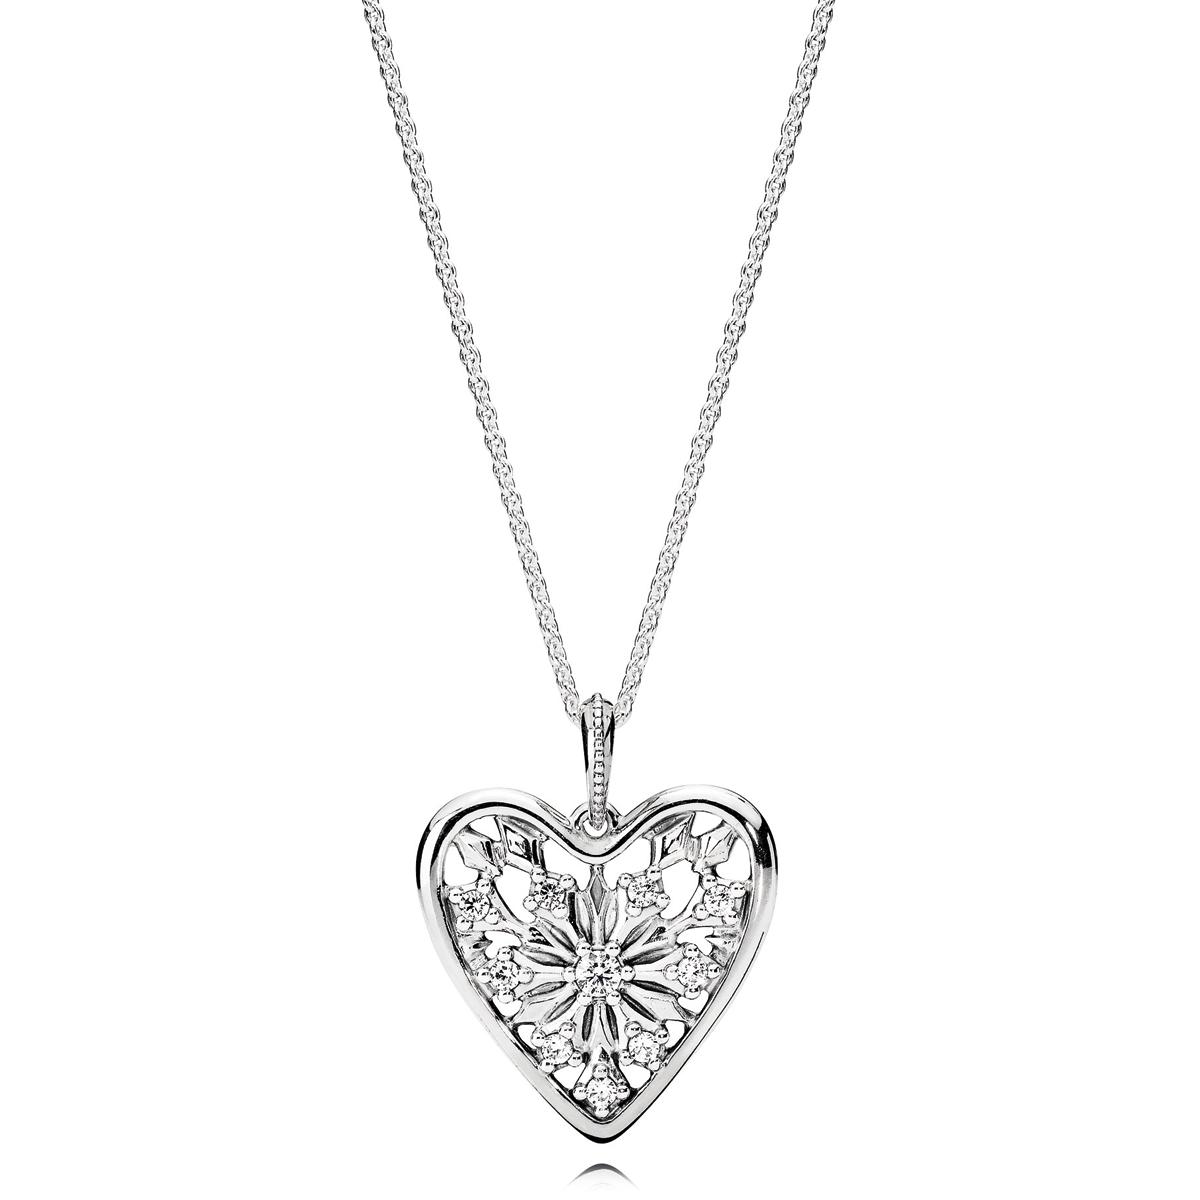 fe62d37fa ... ireland pandora heart of winter cz necklace ca1e2 724bd ...